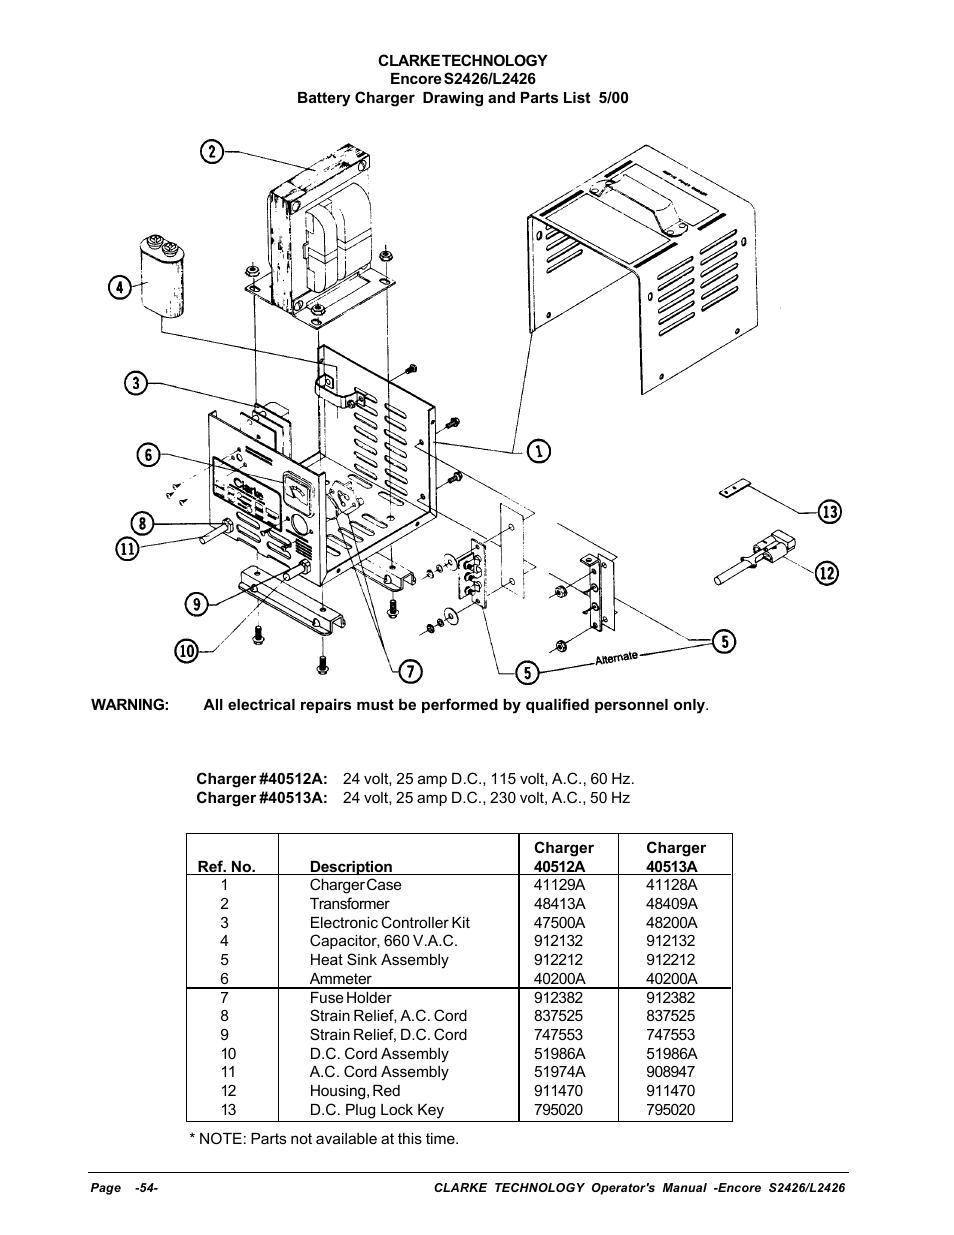 jbl instruction manual charge 3